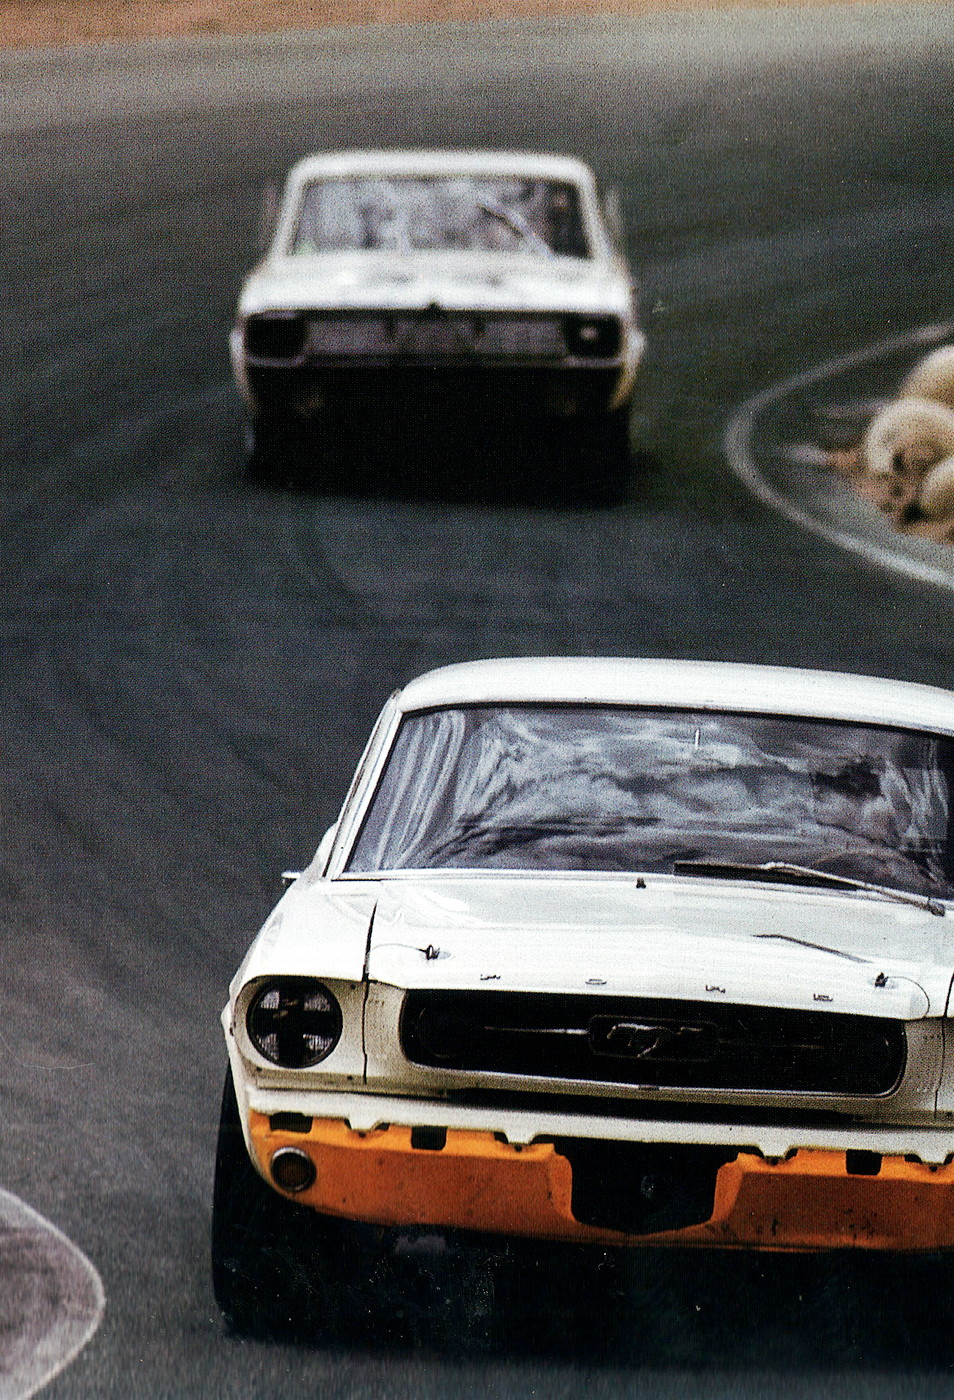 Jerry Titus Mustang(1st) VS BobTullius Dodge Dart(2nd) '66 Riverside